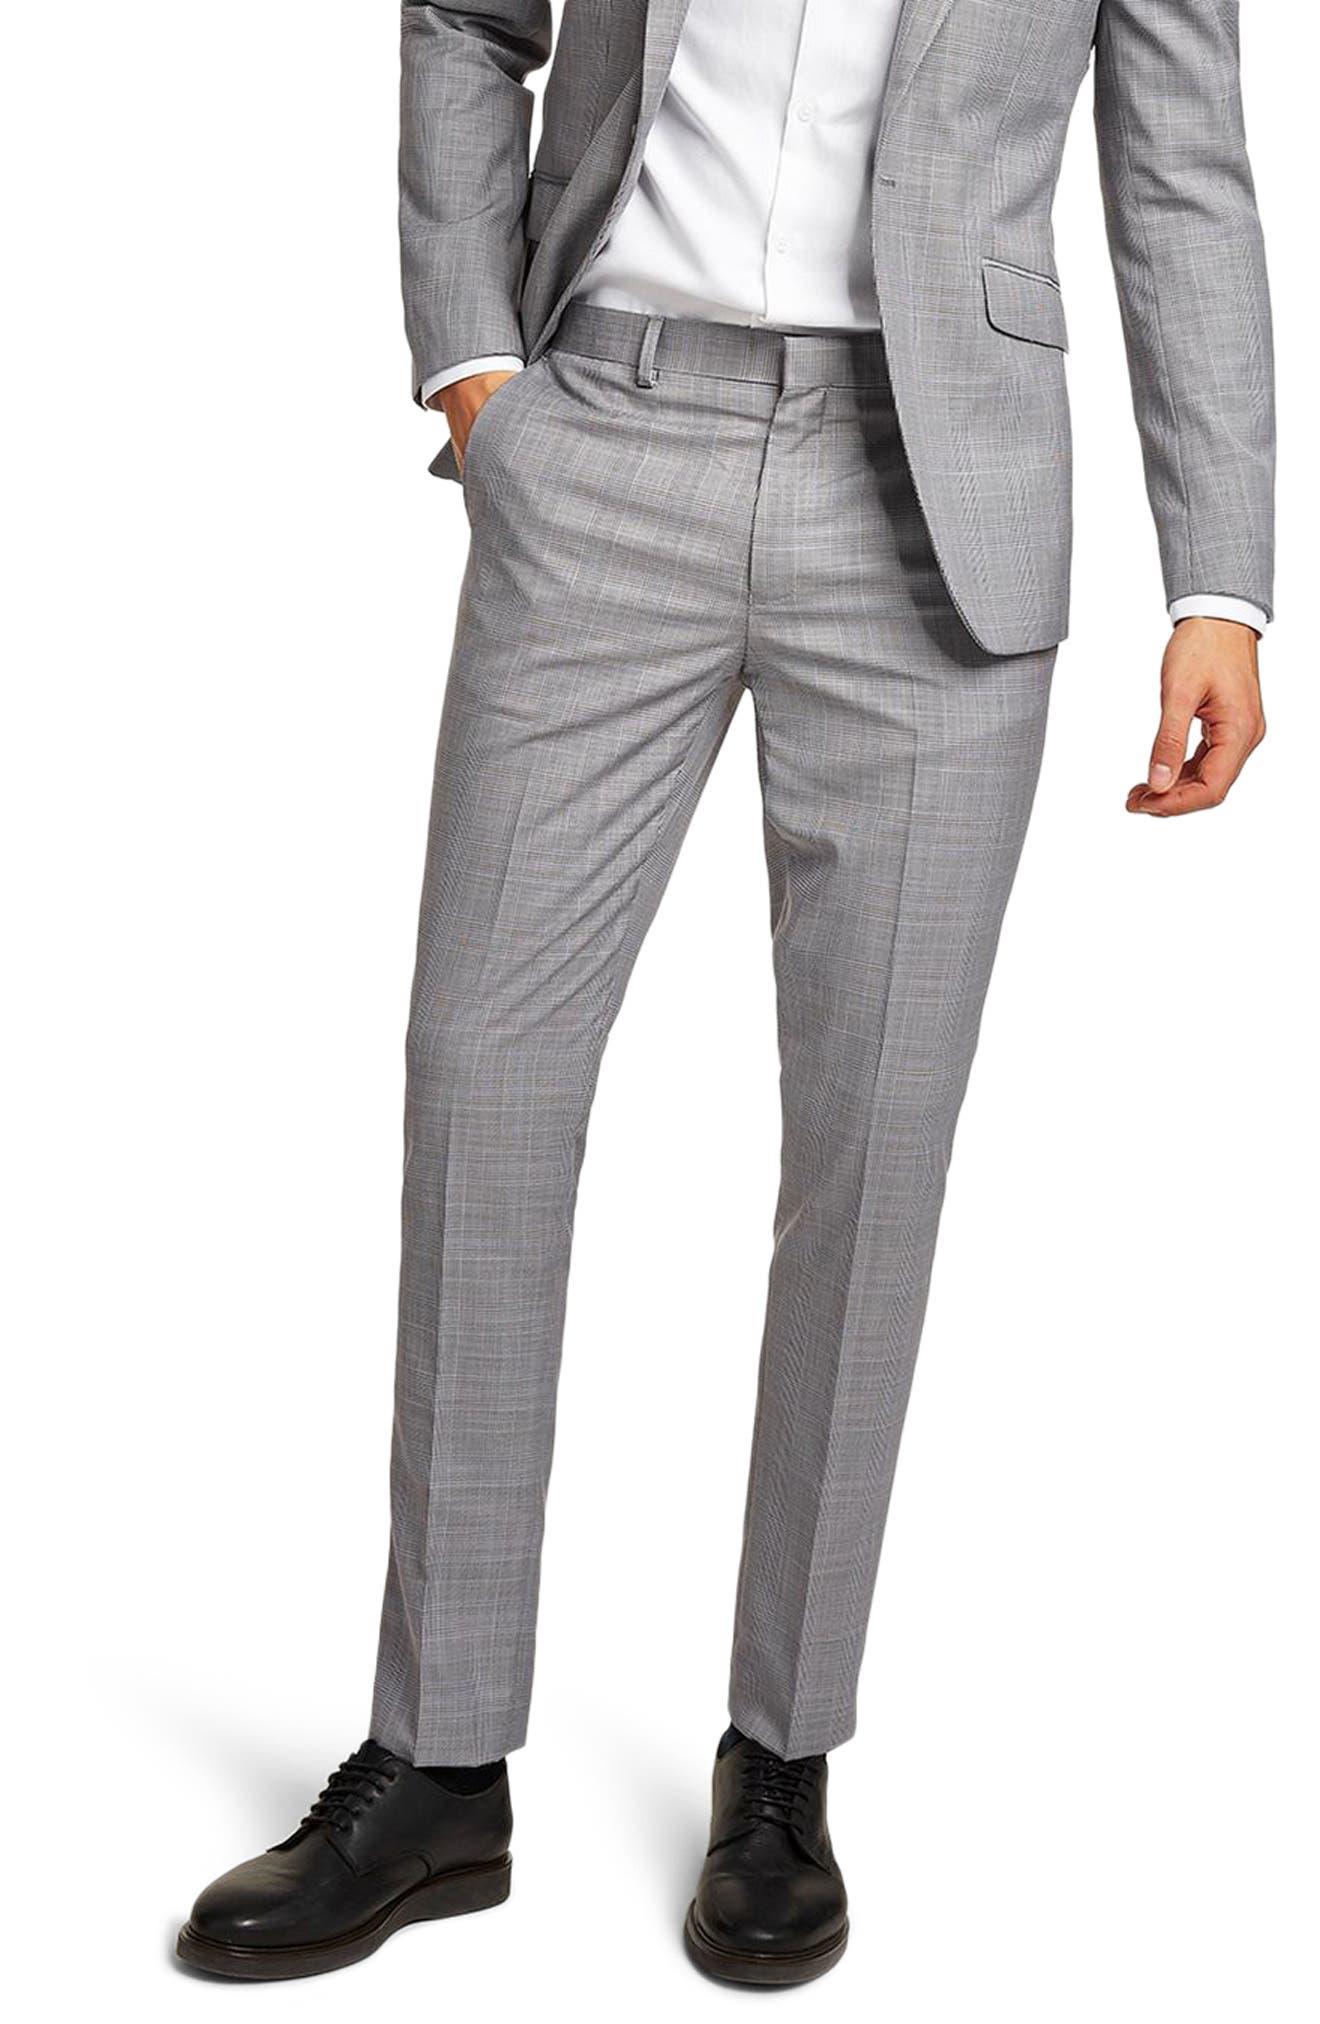 TOPMAN,                             Skinny Fit Check Suit Trousers,                             Main thumbnail 1, color,                             020